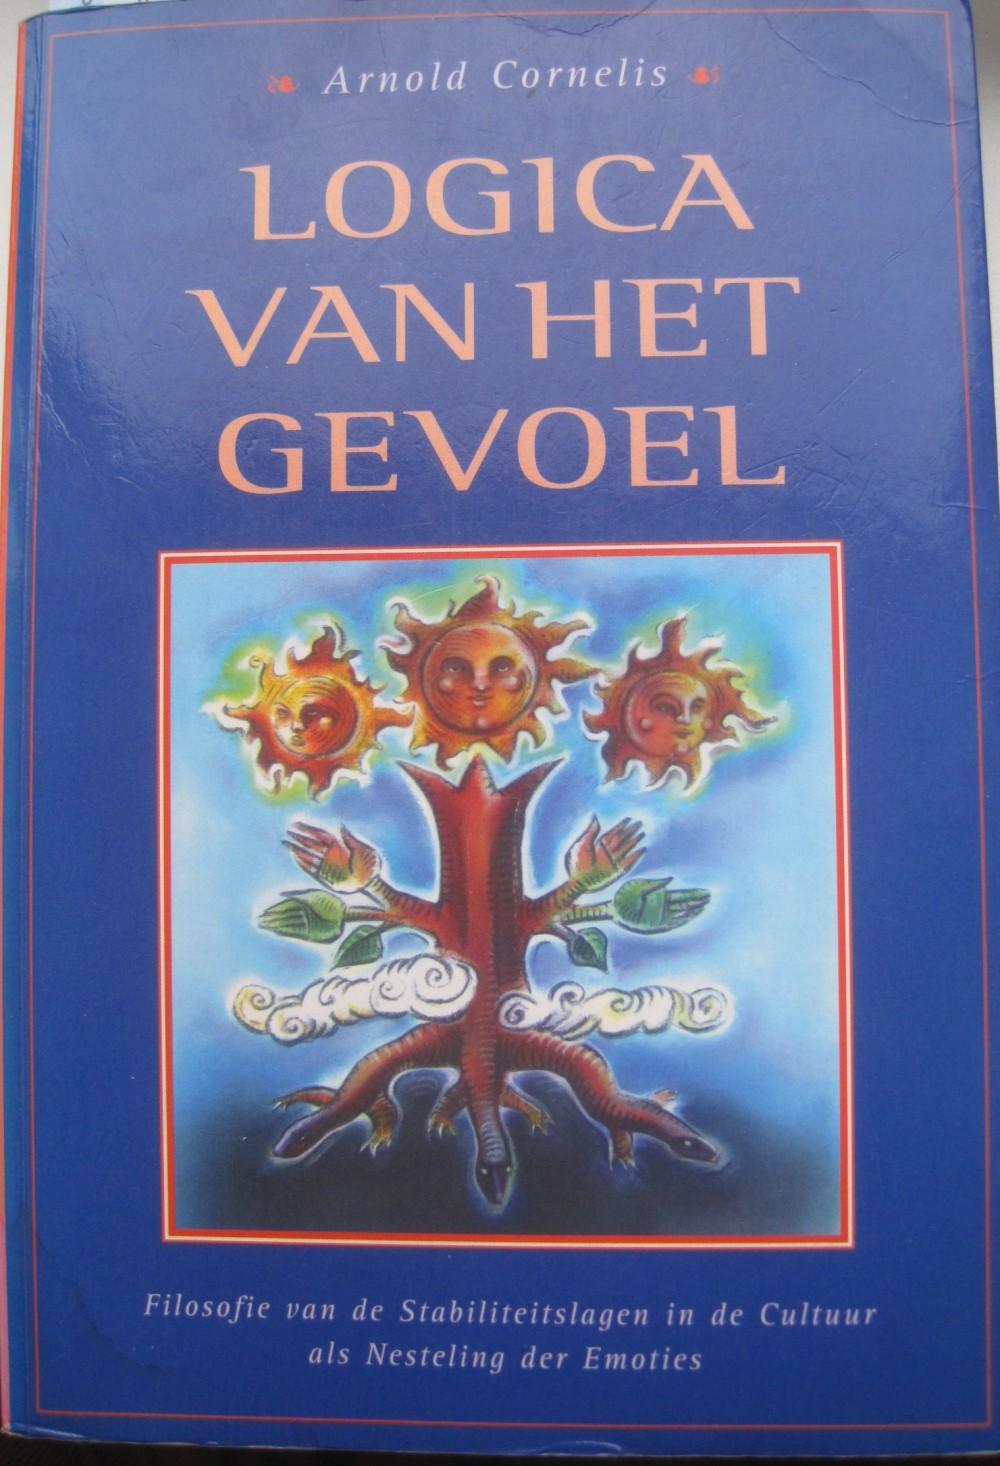 boekomslag A. Cornelis, logica van het gevoel (2)